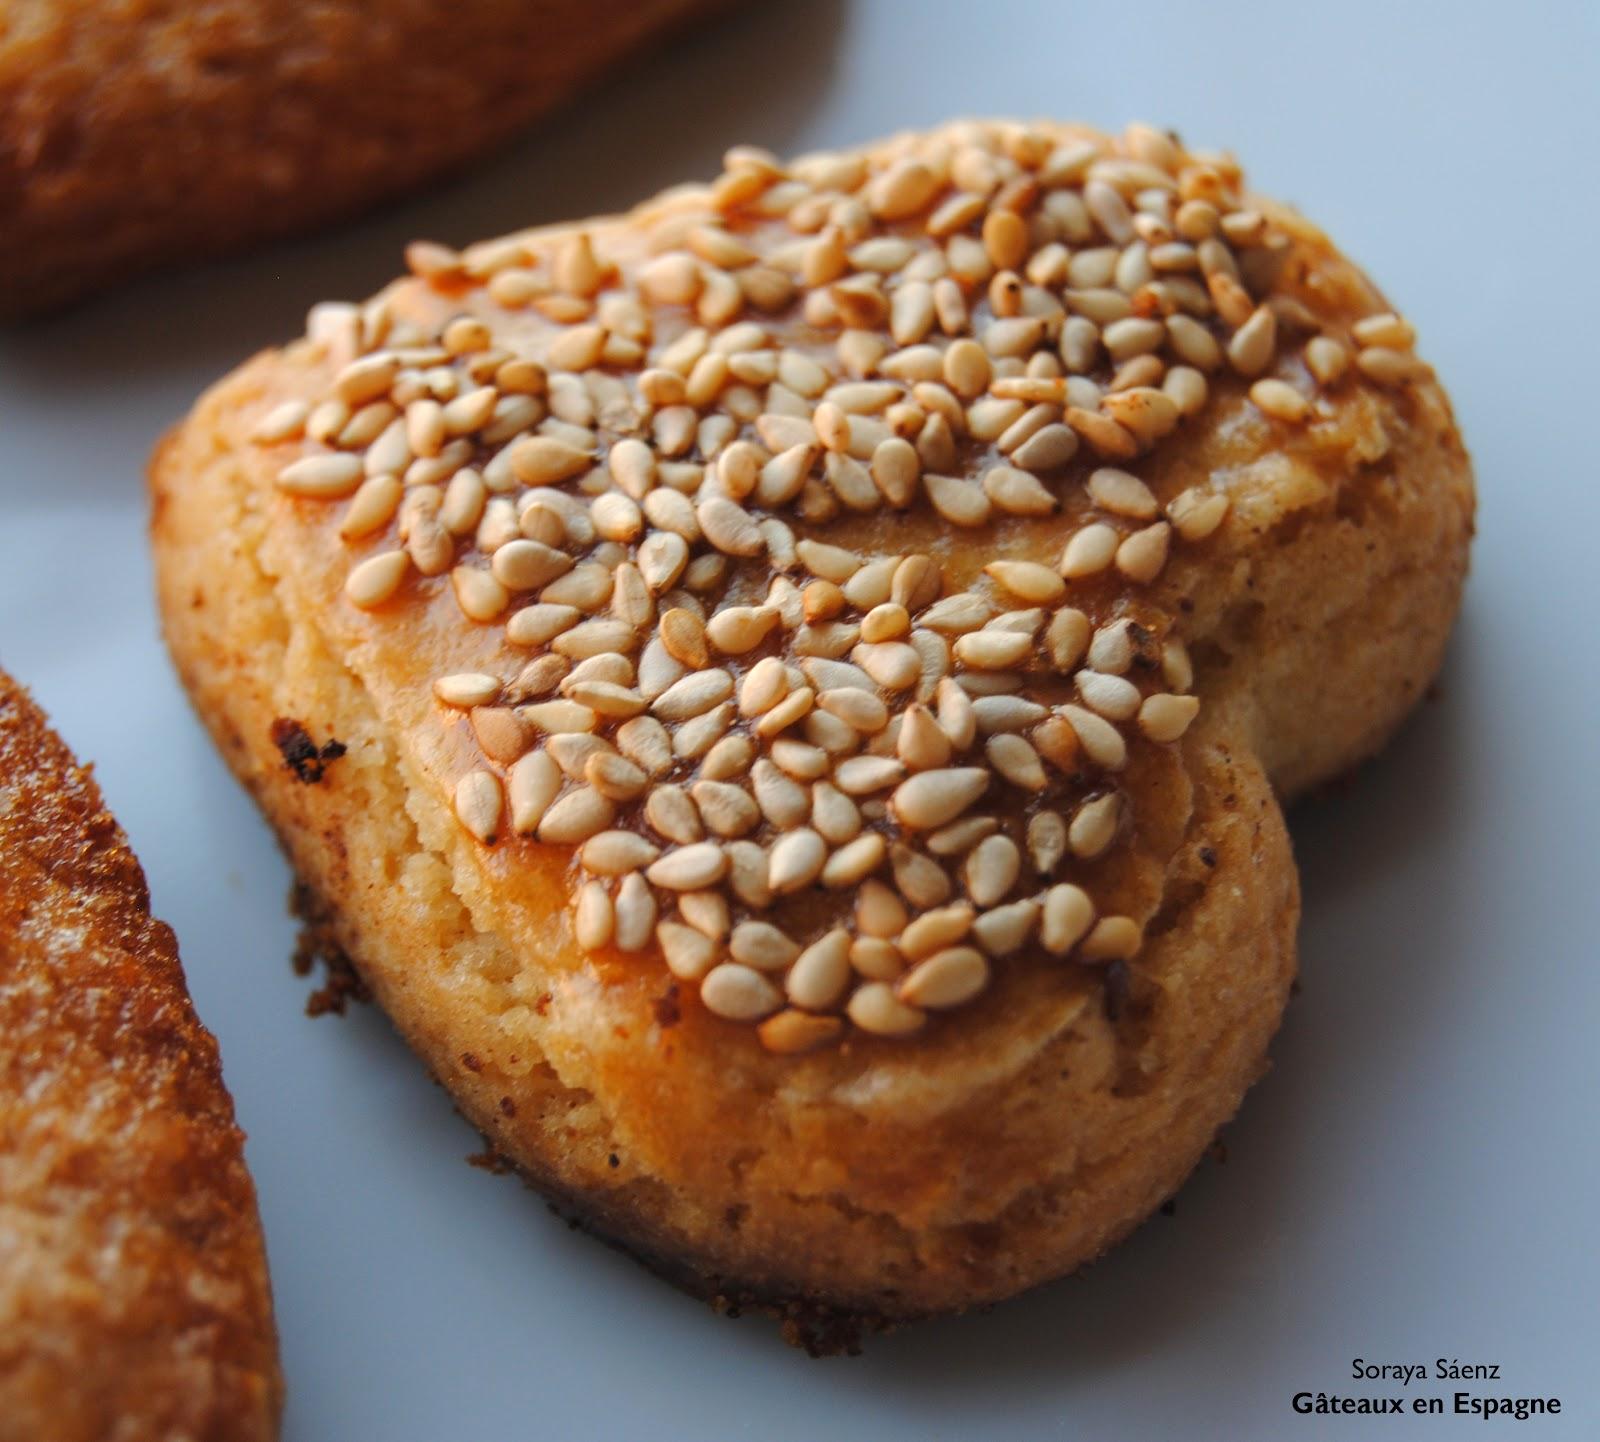 g u00c2teaux en espagne  les biscuits sabl u00e9s espagnols  les